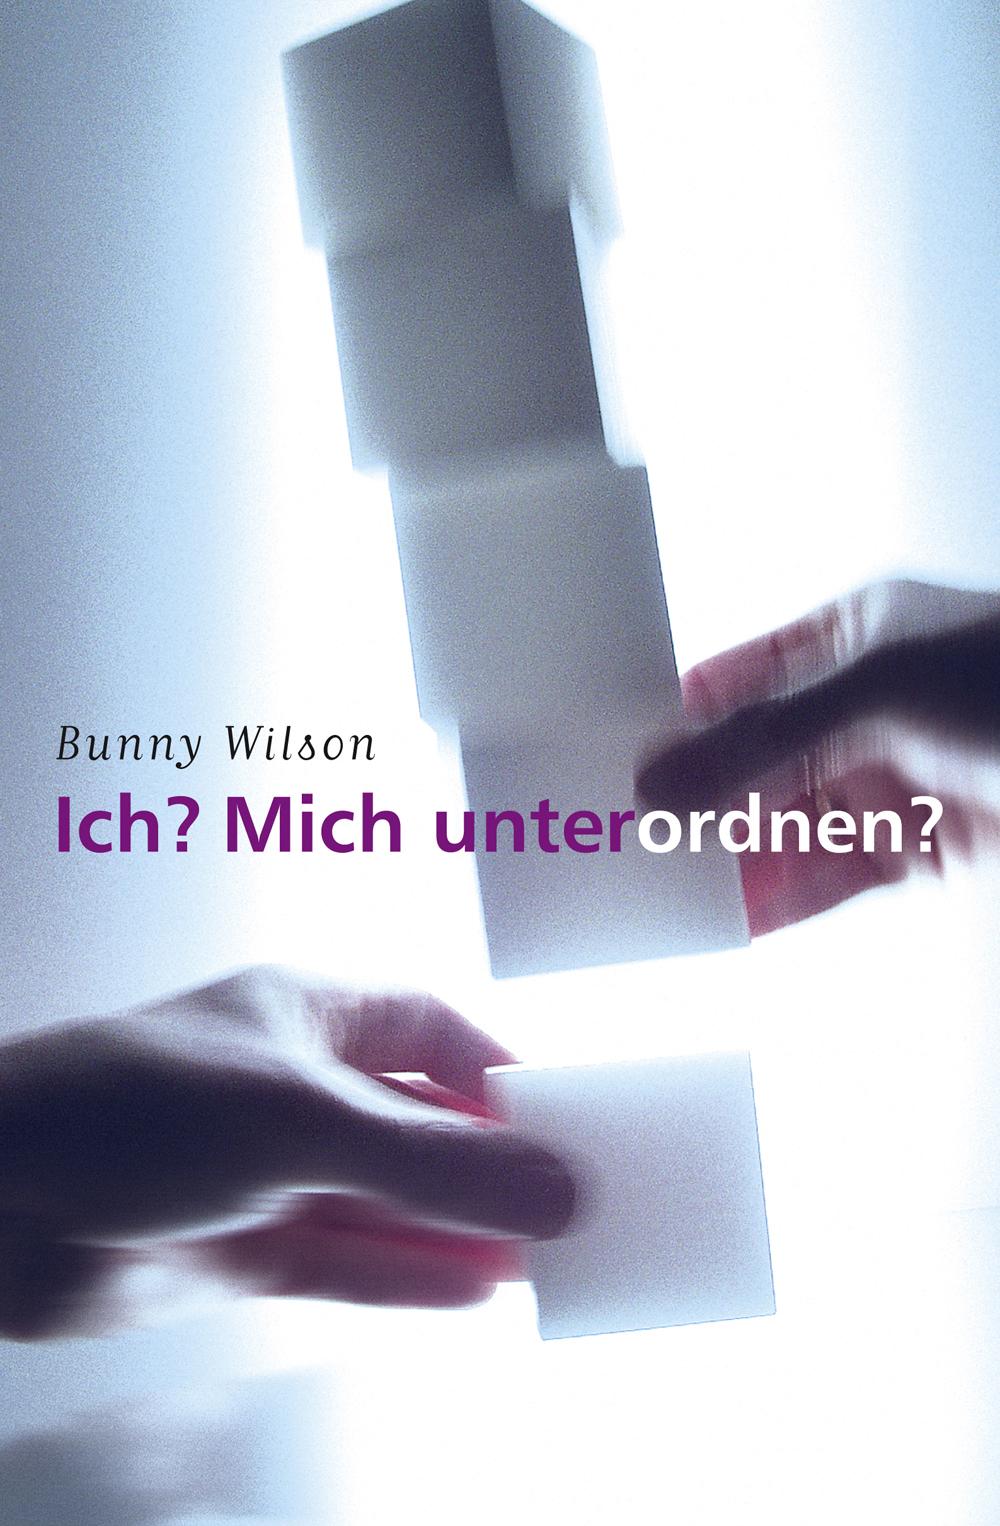 CLV_ich-mich-unterordnen_bunny-p-wilson_255954_1